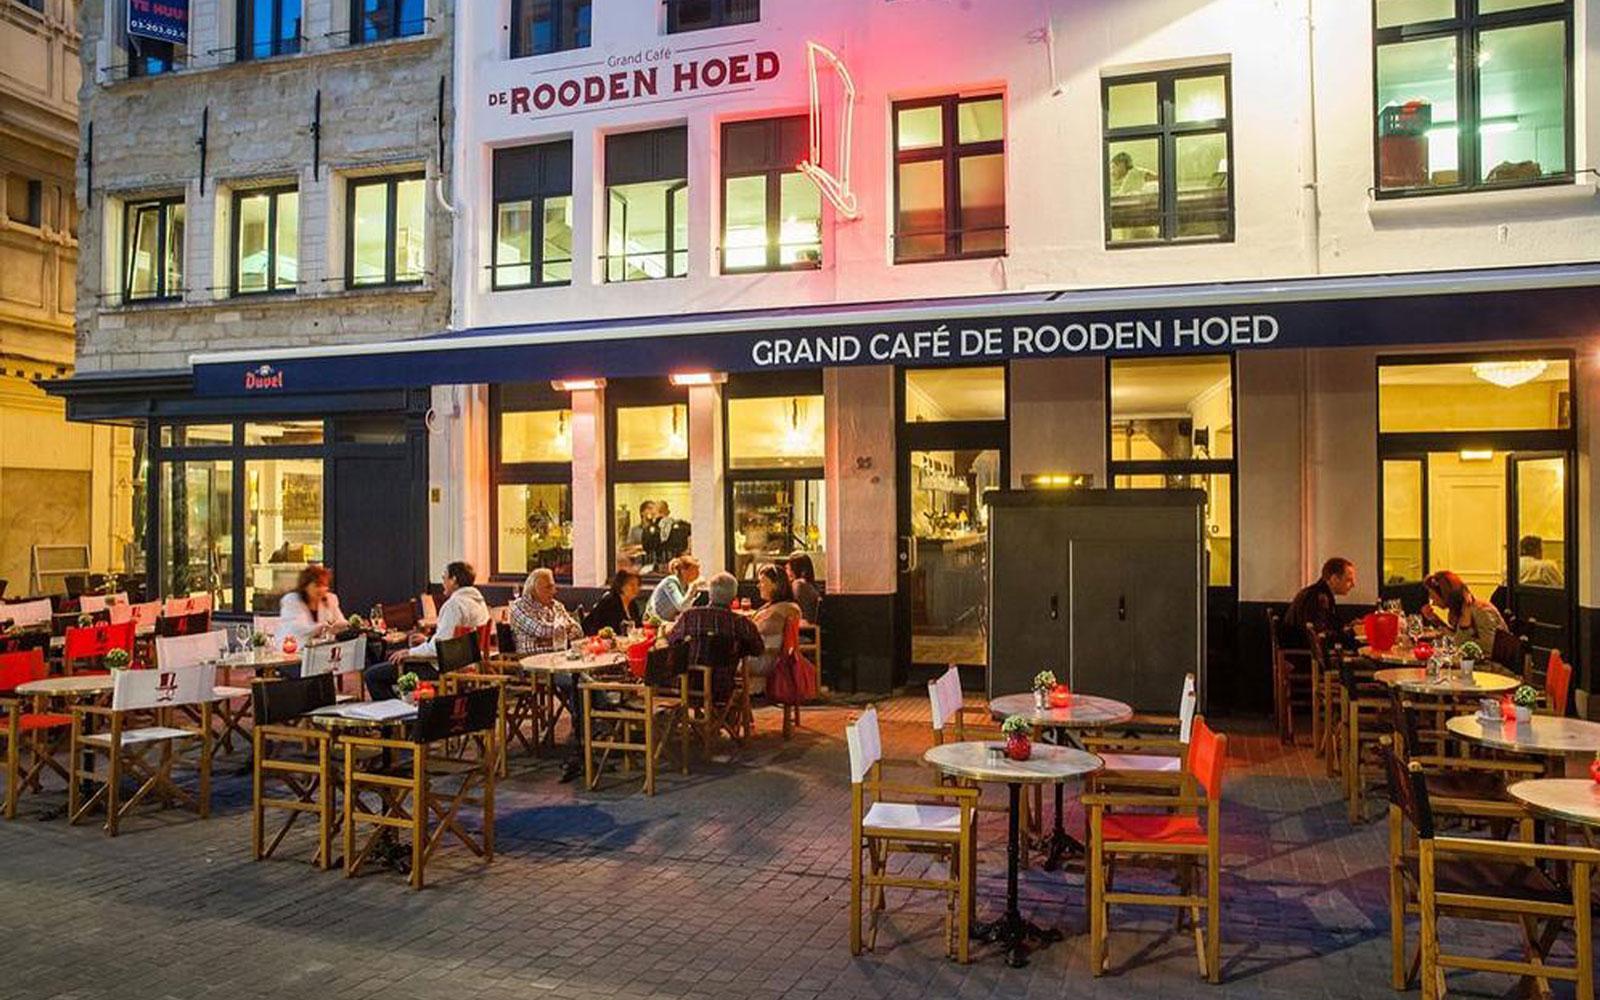 Moderne kroonluchter, Haagse kunsthandel, kristallen, Decoratie, Café, Antwerpen